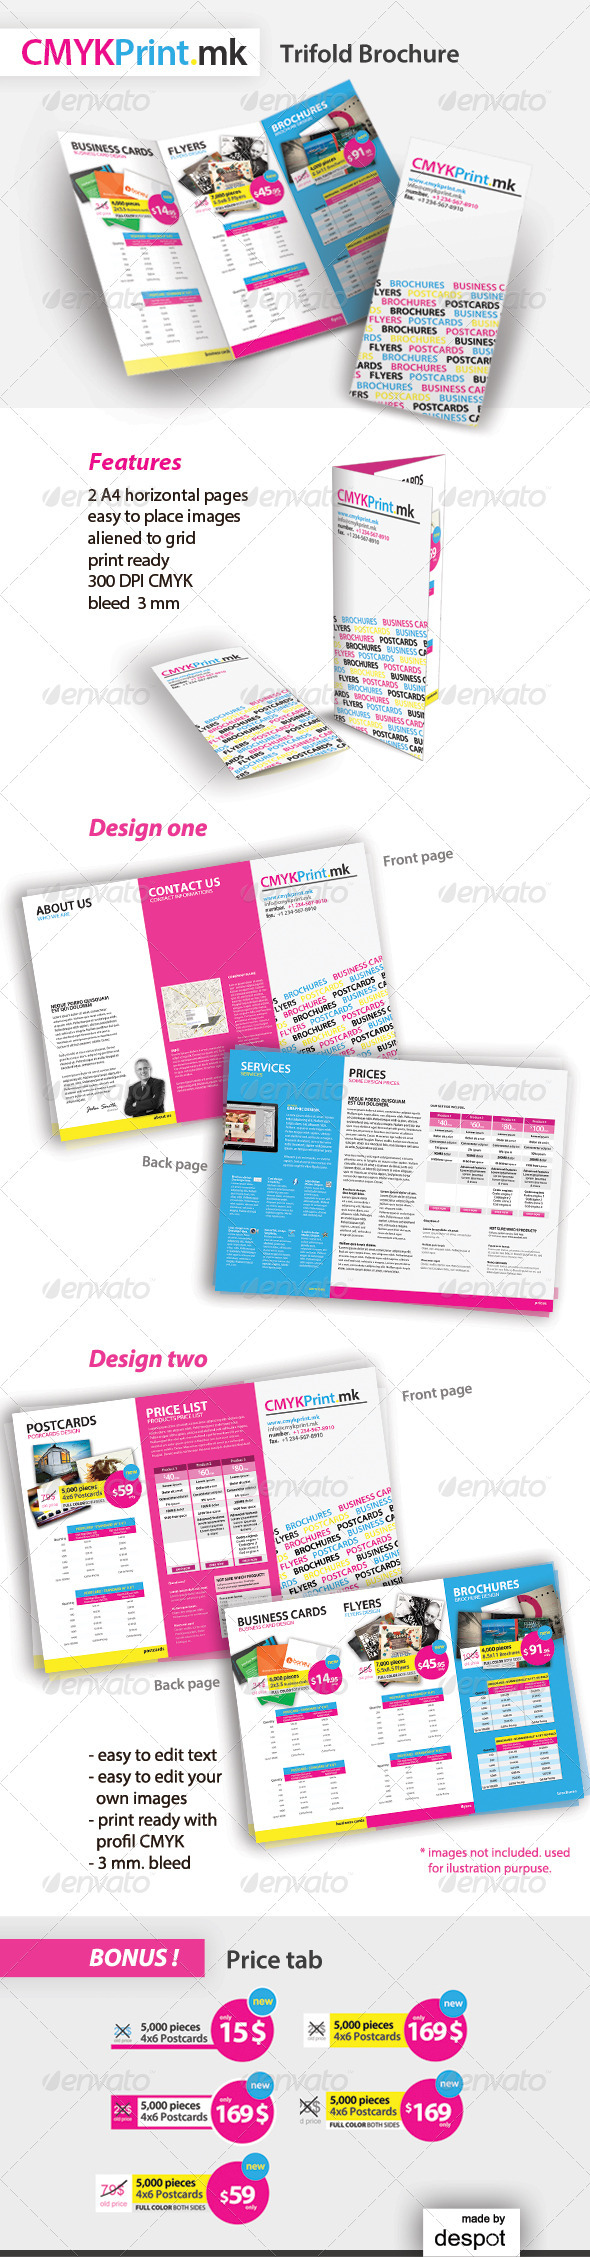 GraphicRiver CMYK Print Trifold Brochure 2782341